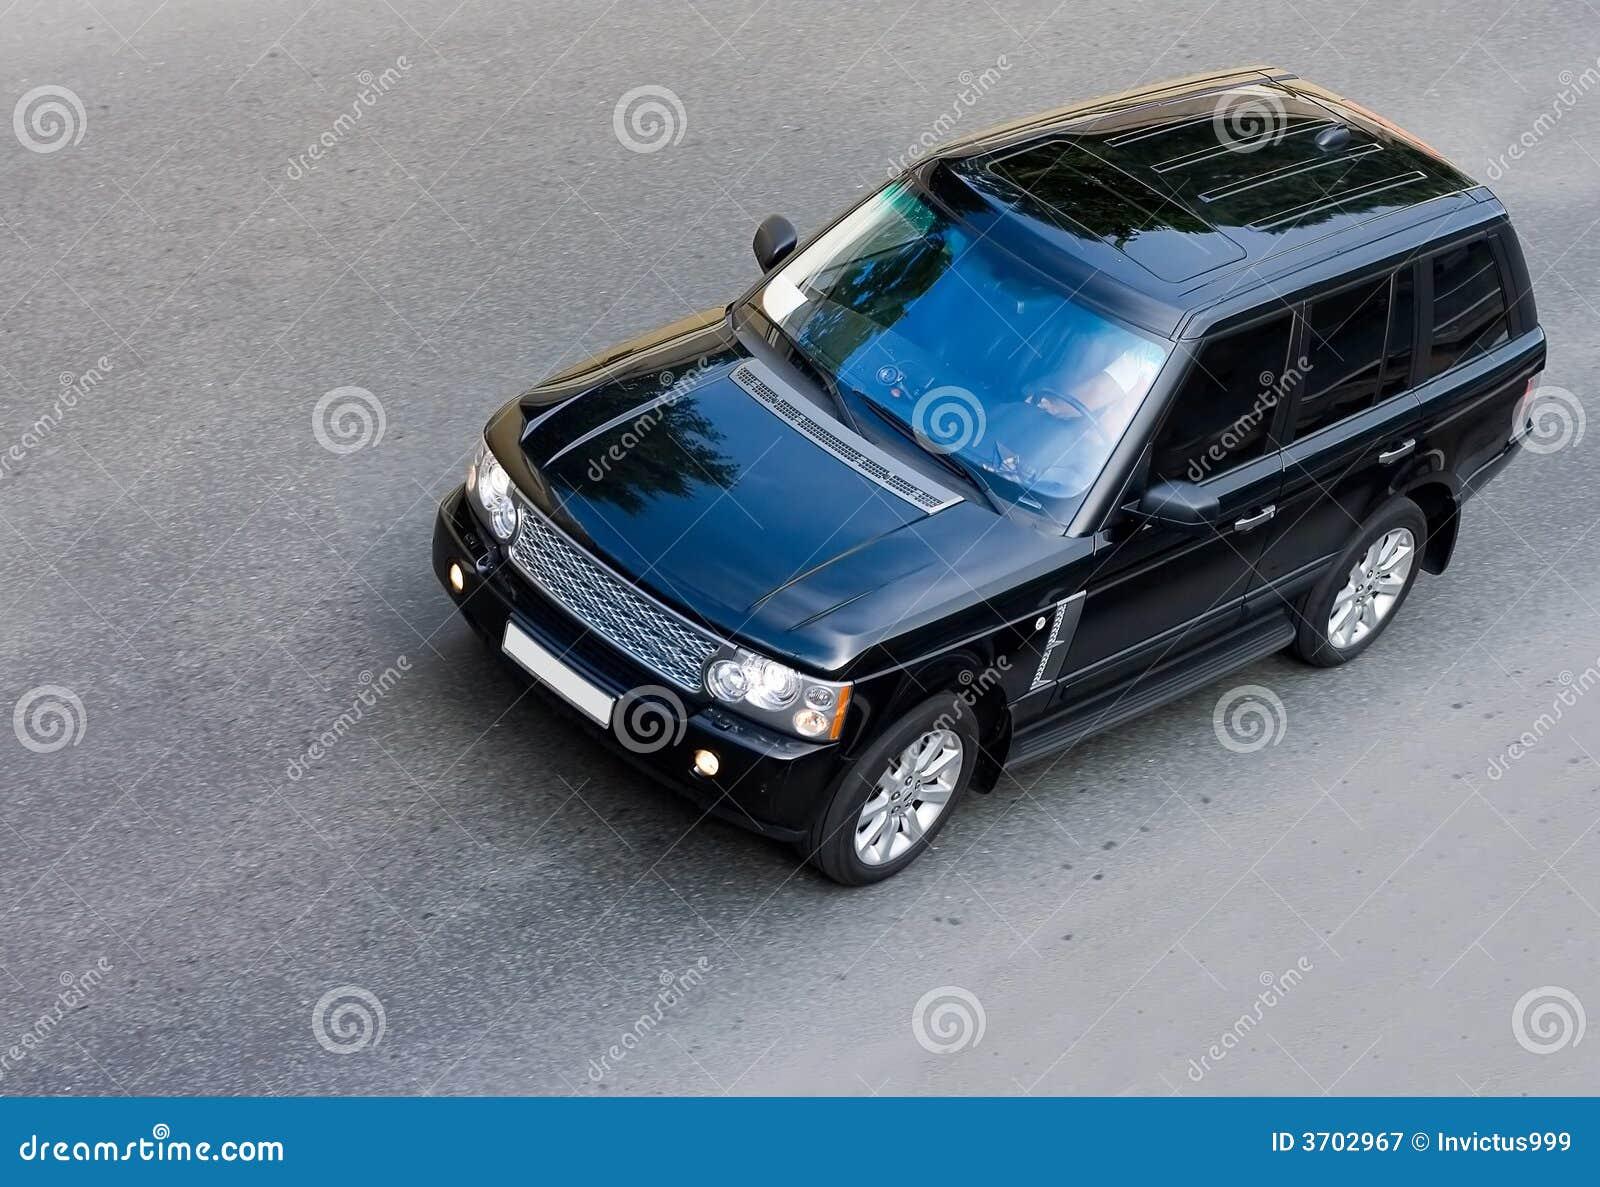 Range Rover Sport: Volvo camo hides new luxury British SUV ...